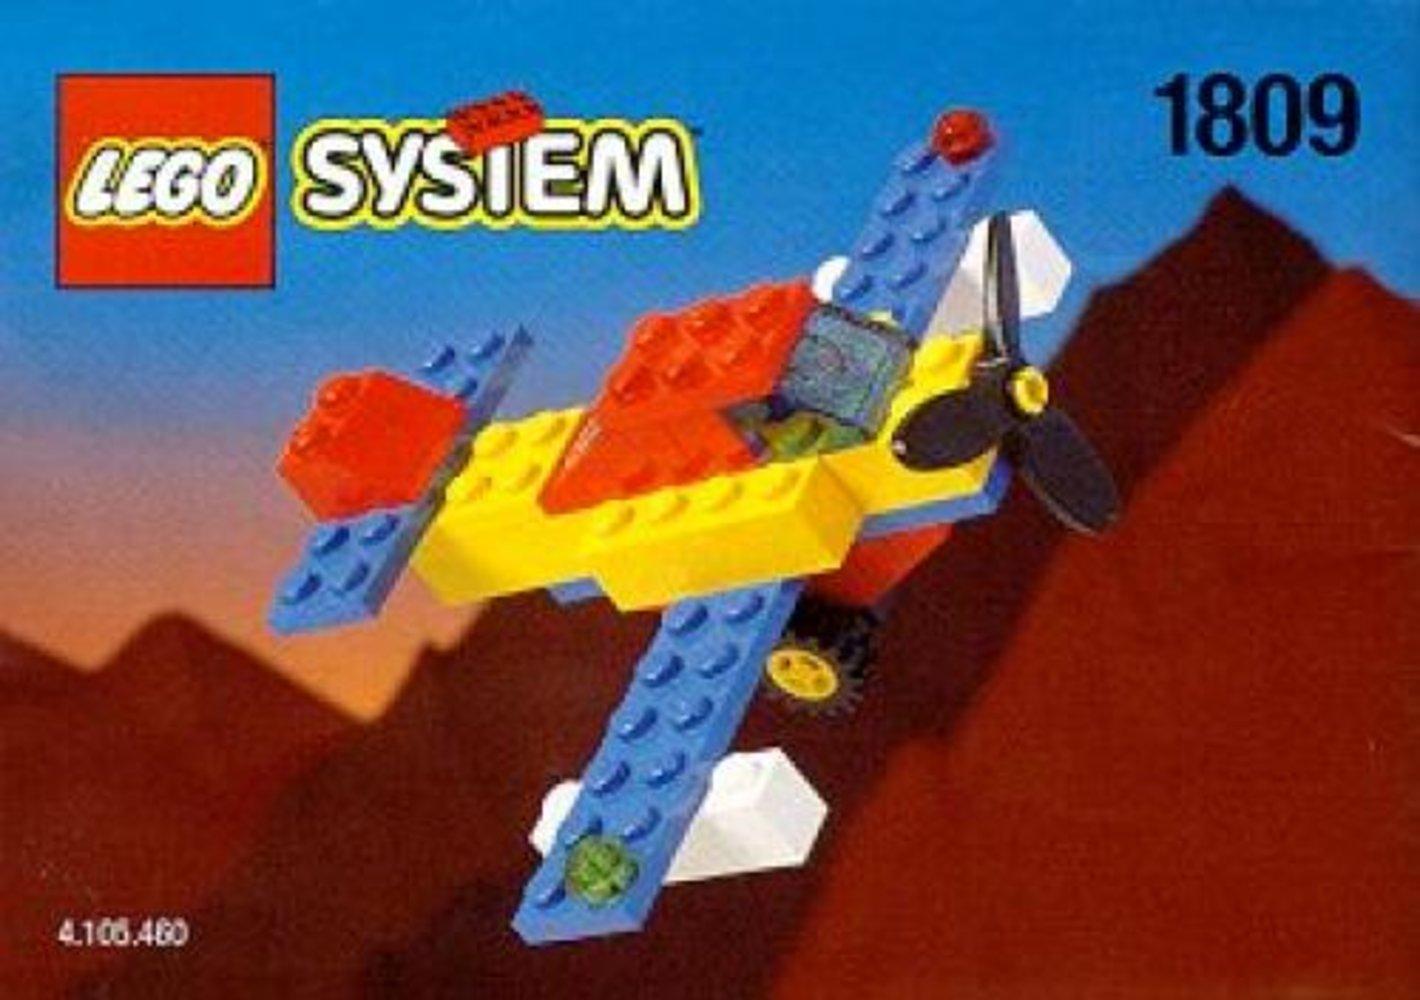 Condor Promotional Airplane